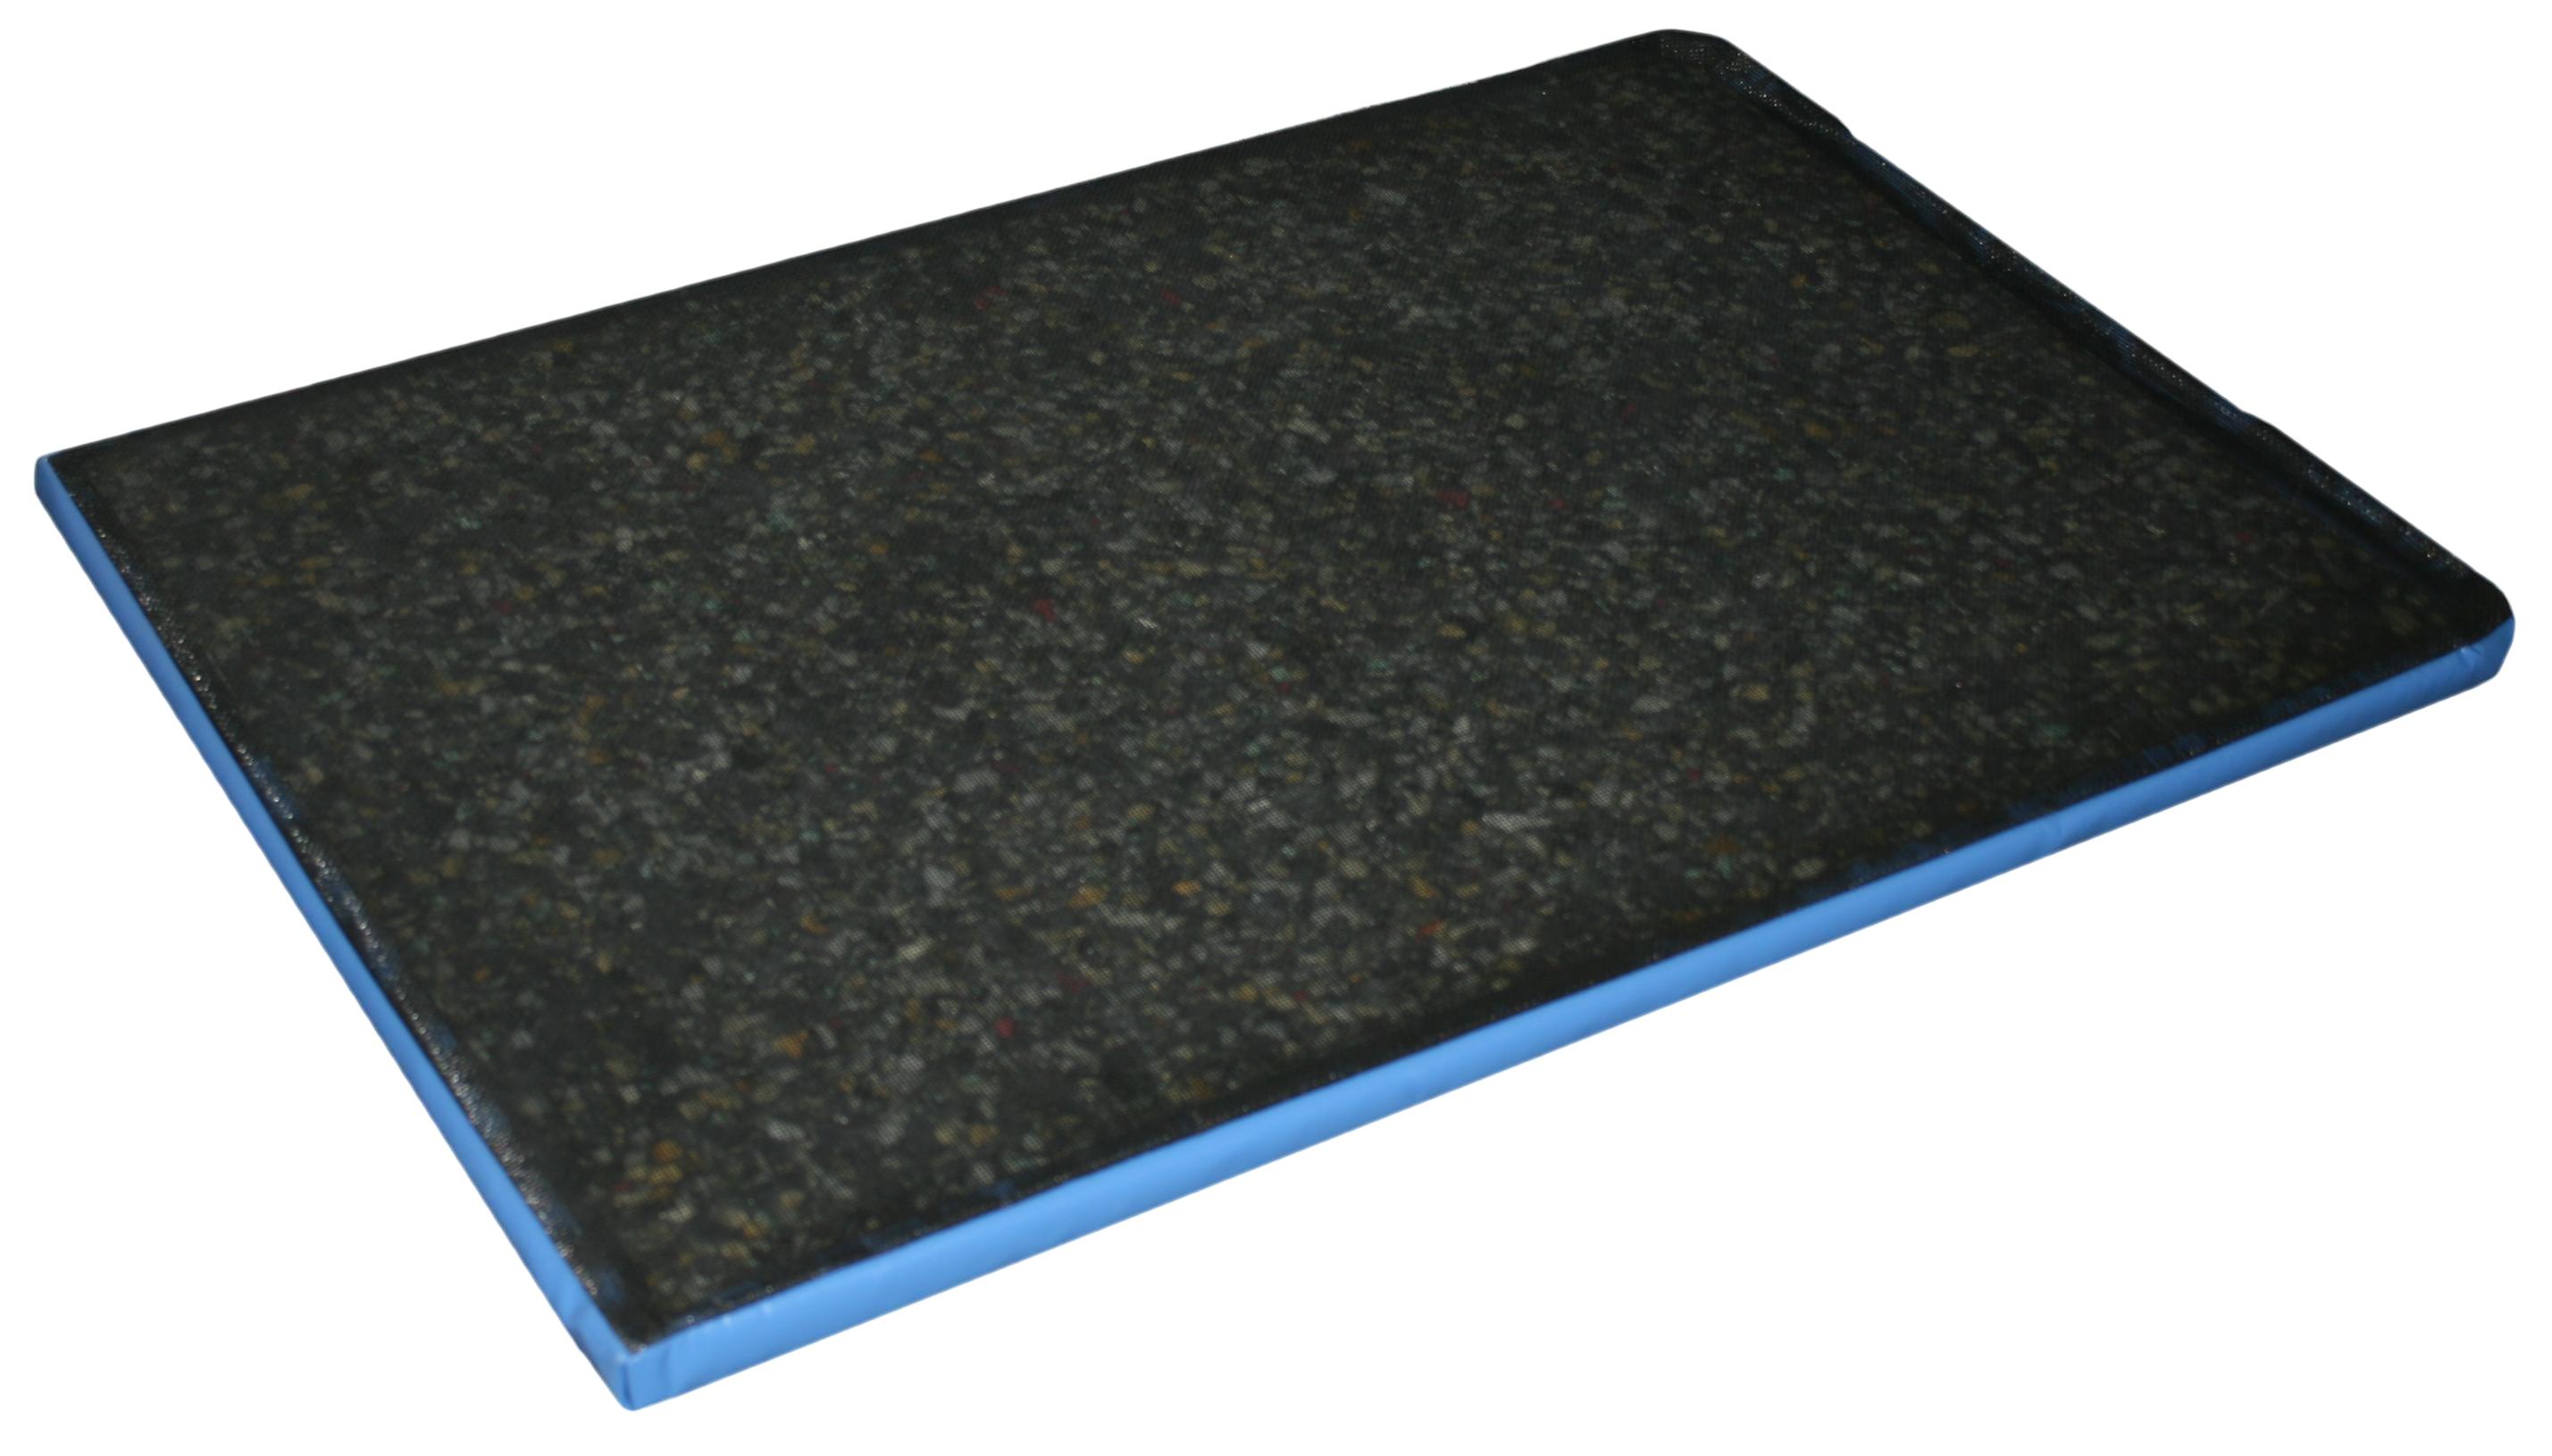 Ontsmettingsmat 85x60x3,5cm